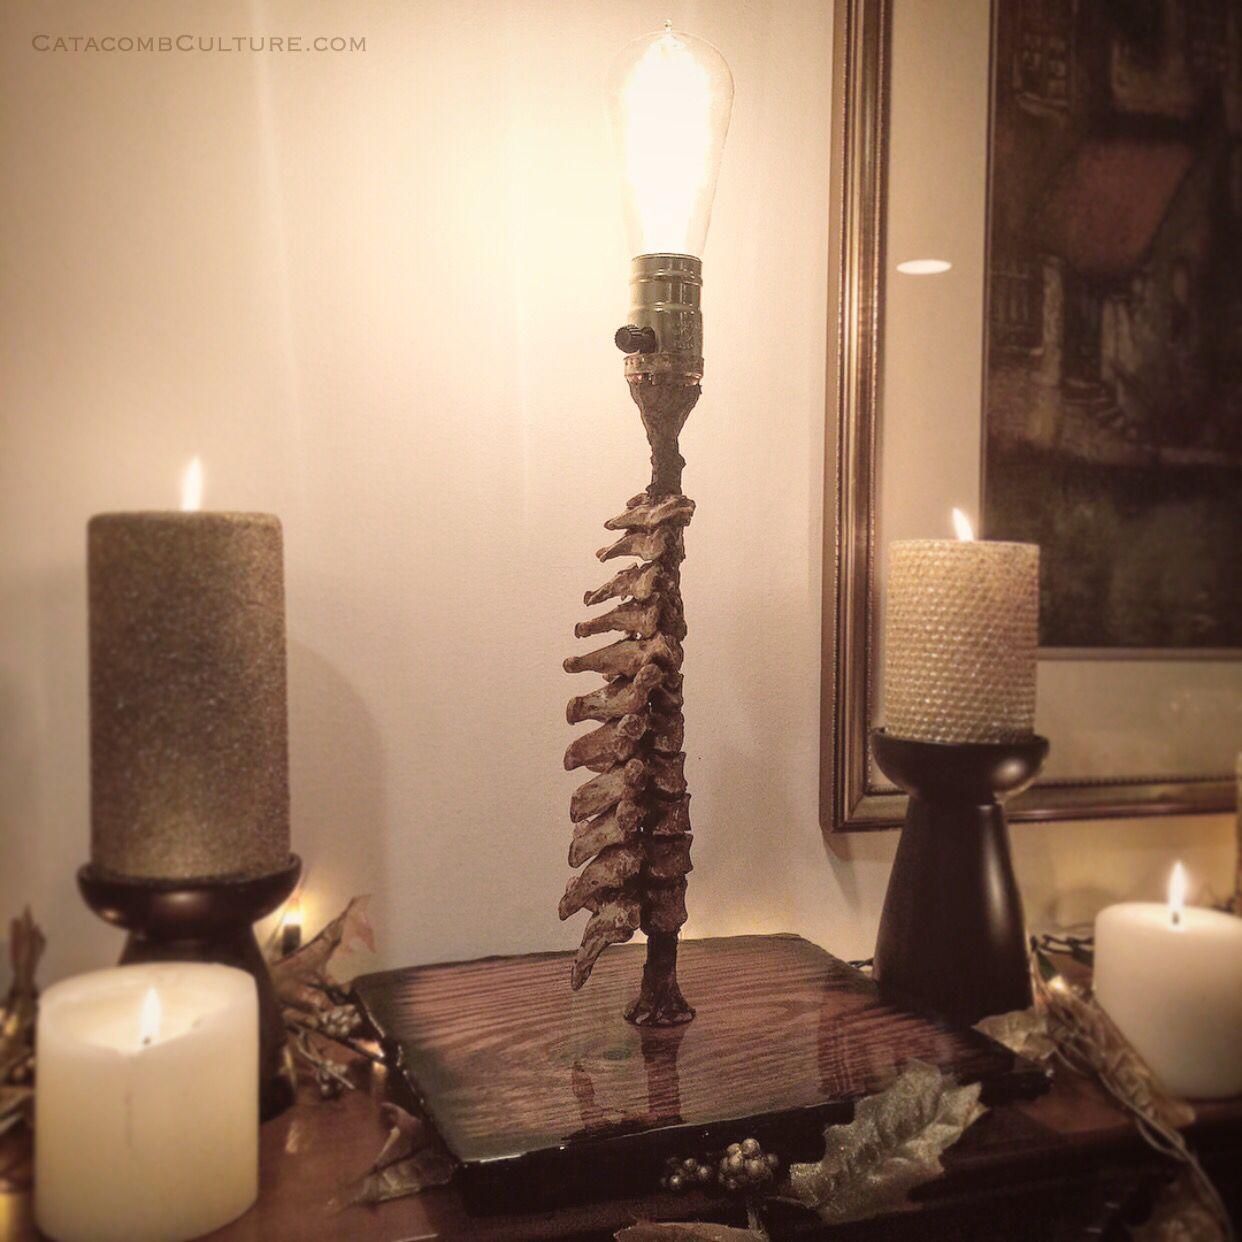 Spine Of The Princess Lamp Explore Bone Decor Art At Catacombculture Https Www Etsy